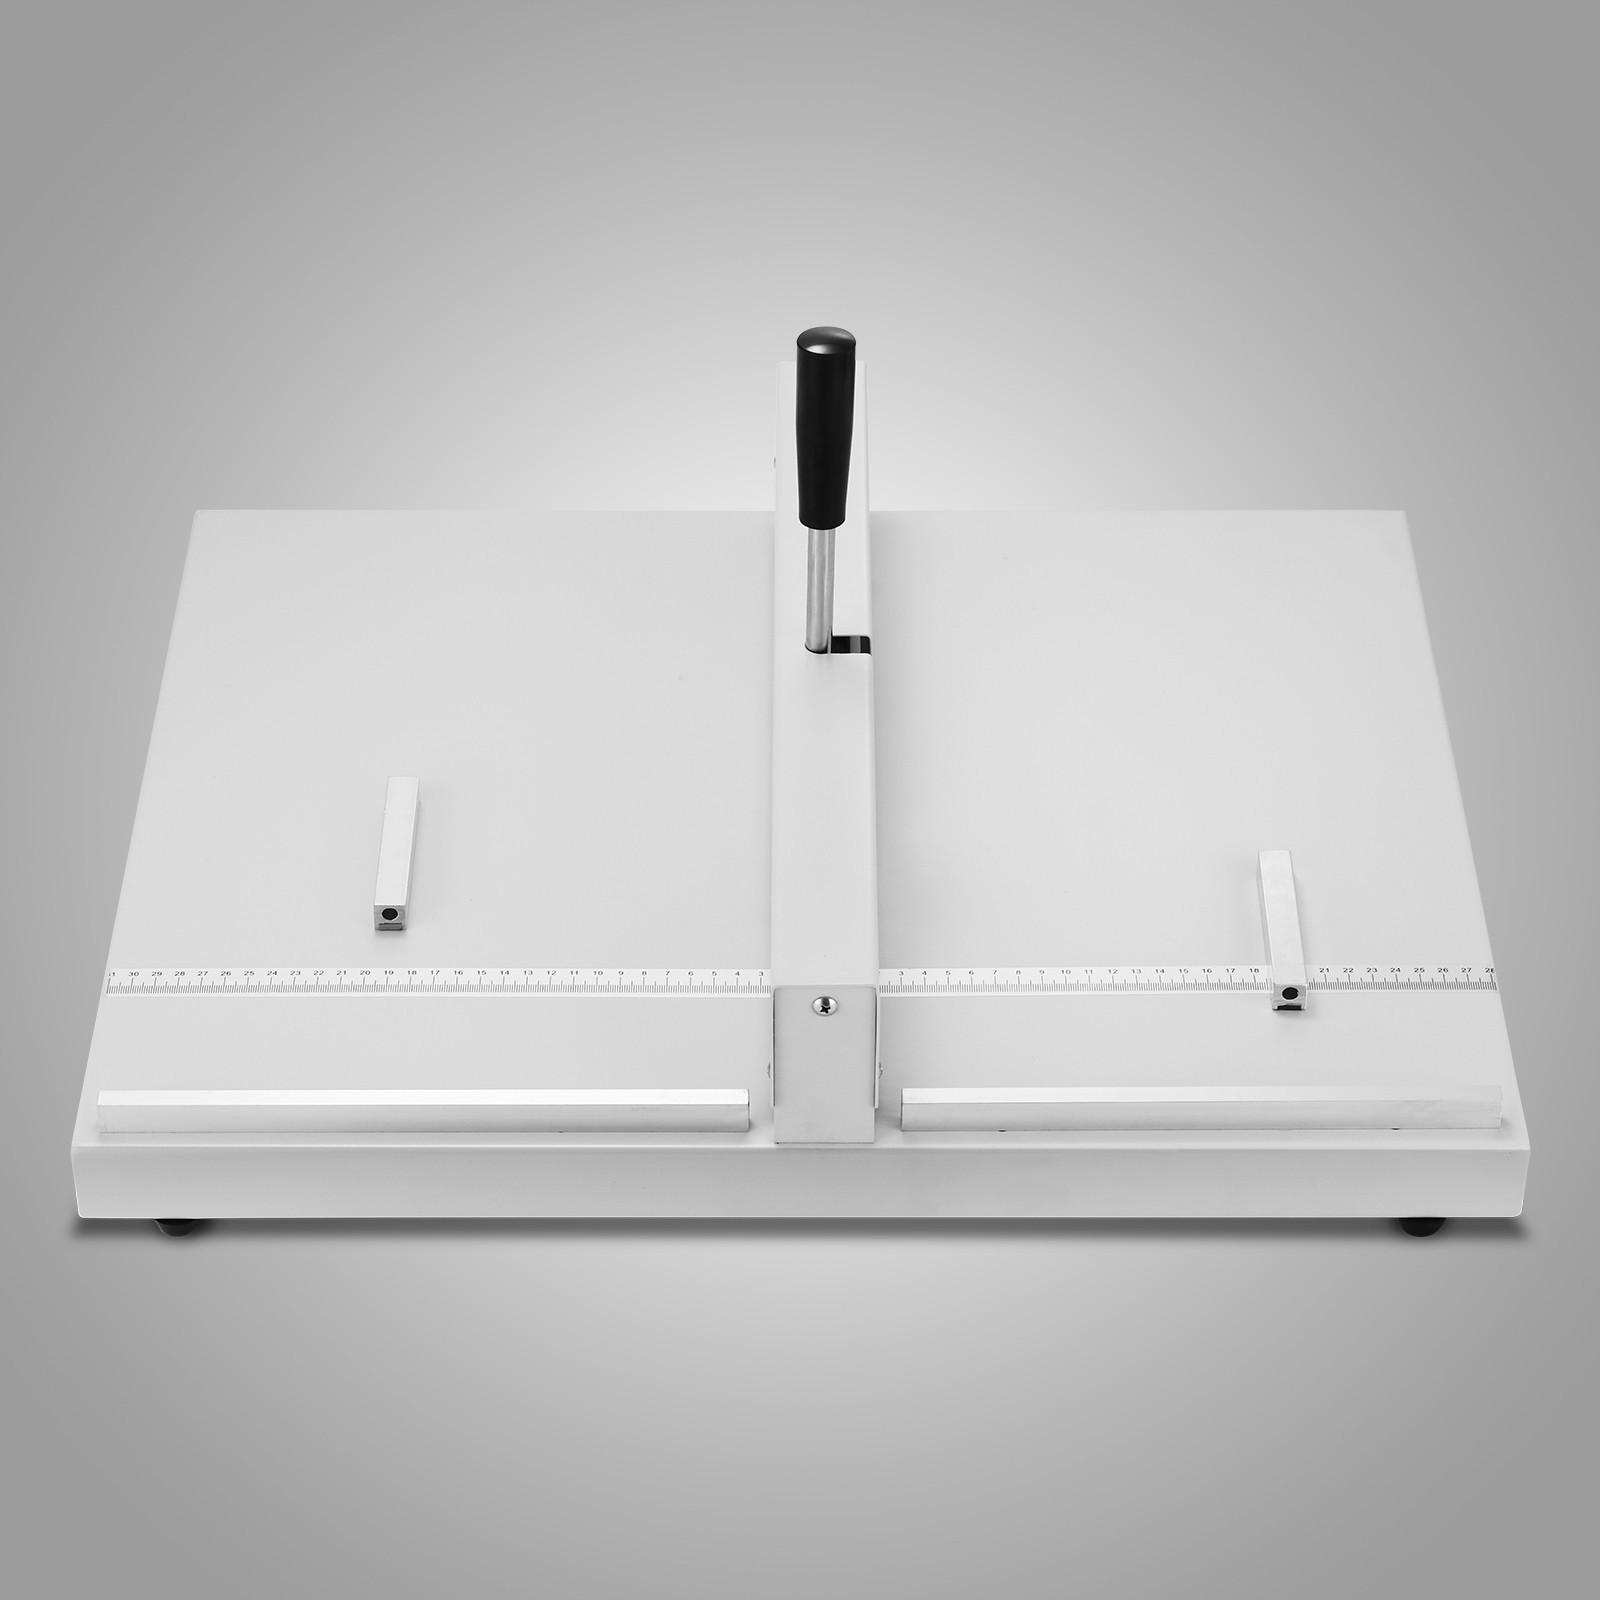 Cordonatrice-Perforatrice-Max-350-520mm-Profondita-Regolabile-Elettrica-Manuale miniatura 39